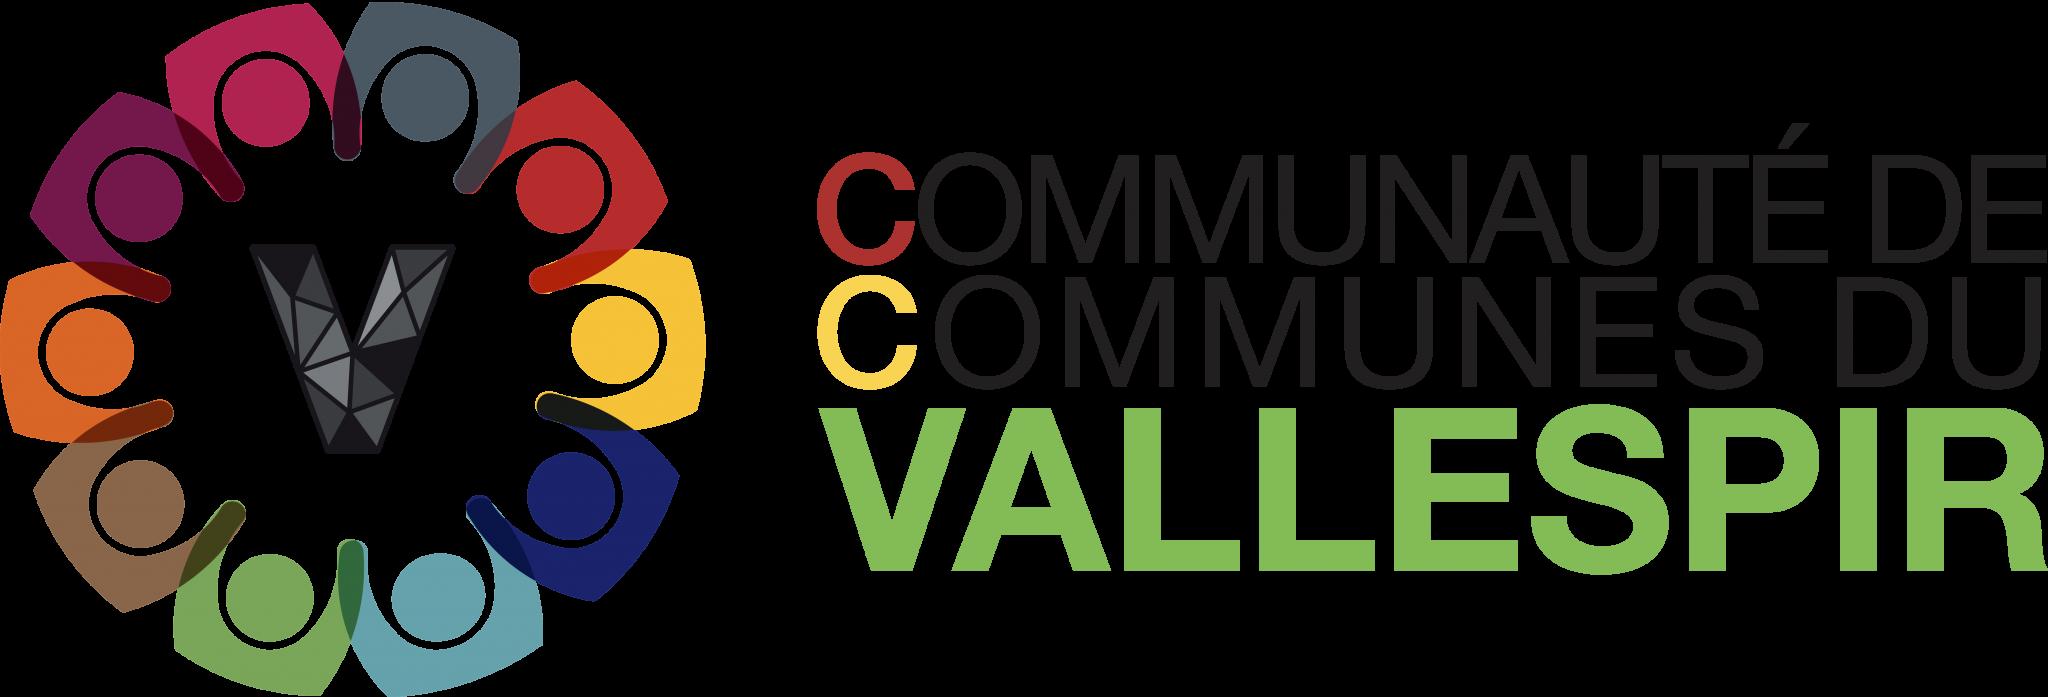 CC Vallespir